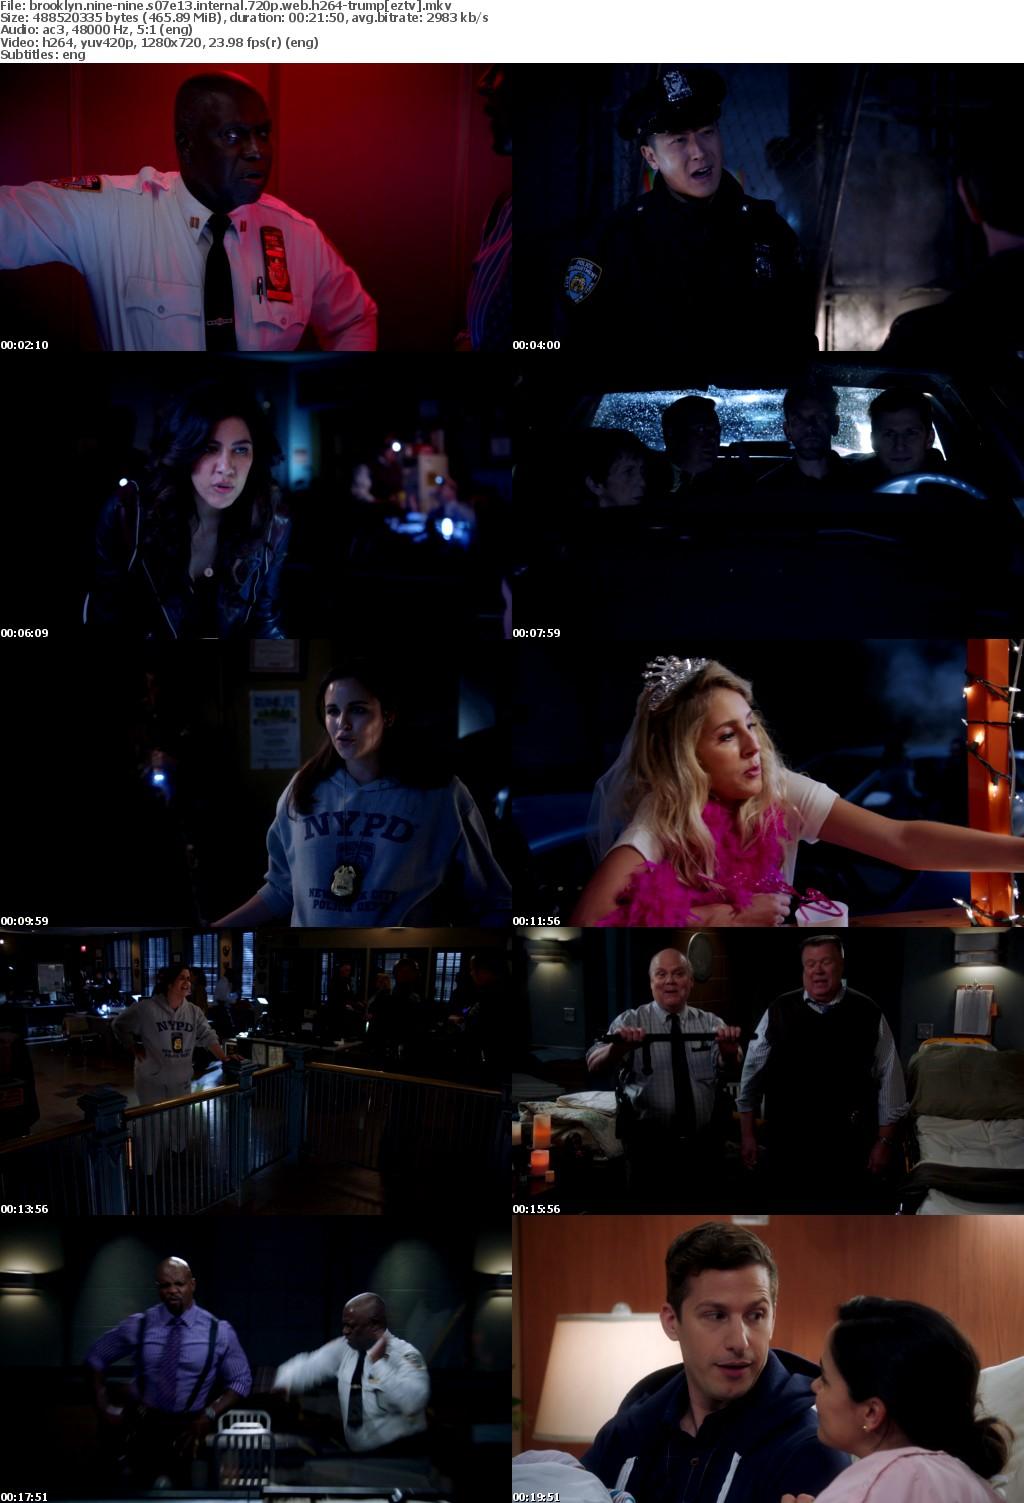 Brooklyn Nine-Nine S07E13 iNTERNAL 720p WEB h264-TRUMP